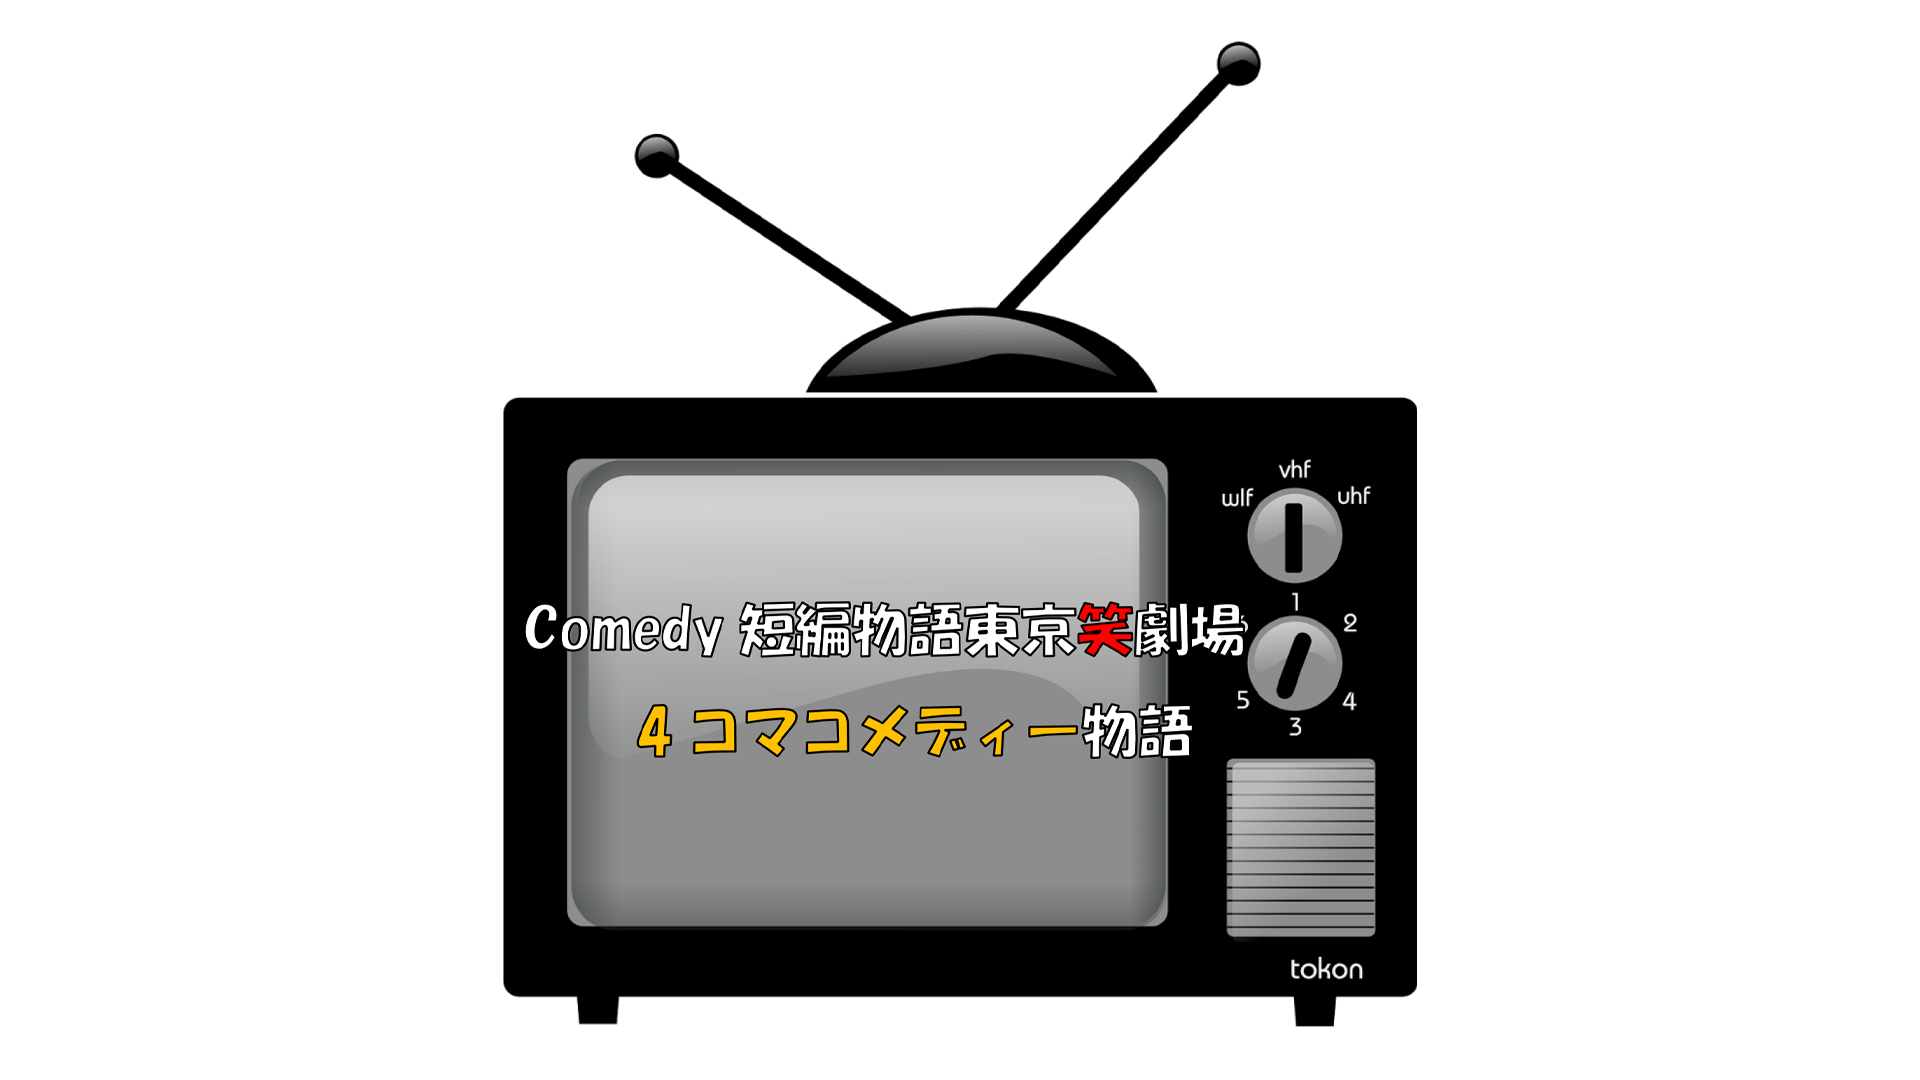 Comedy短編物語東京笑劇場 4コマコメディー物語